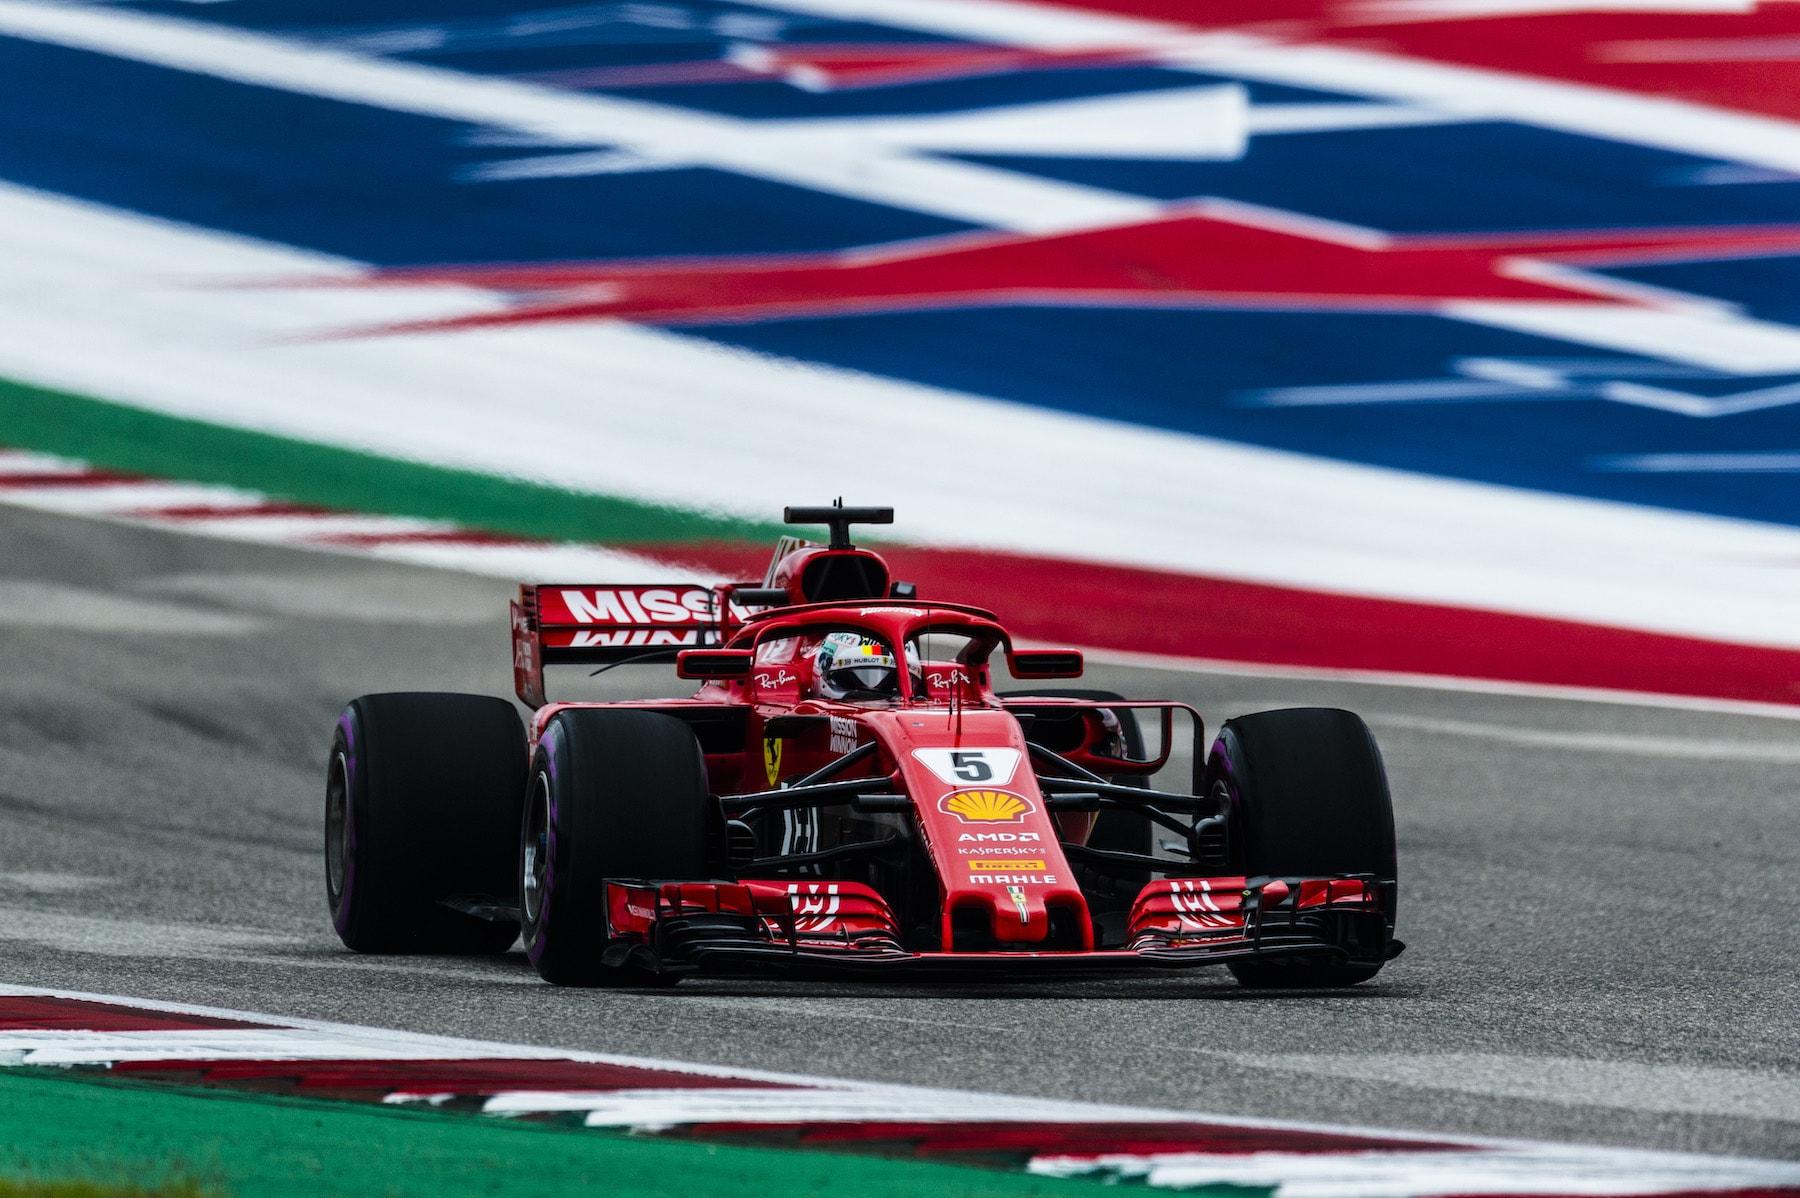 F 2018 Sebastian Vettel | Ferrari SF71H | 2018 USGP P4 1 copy.jpg